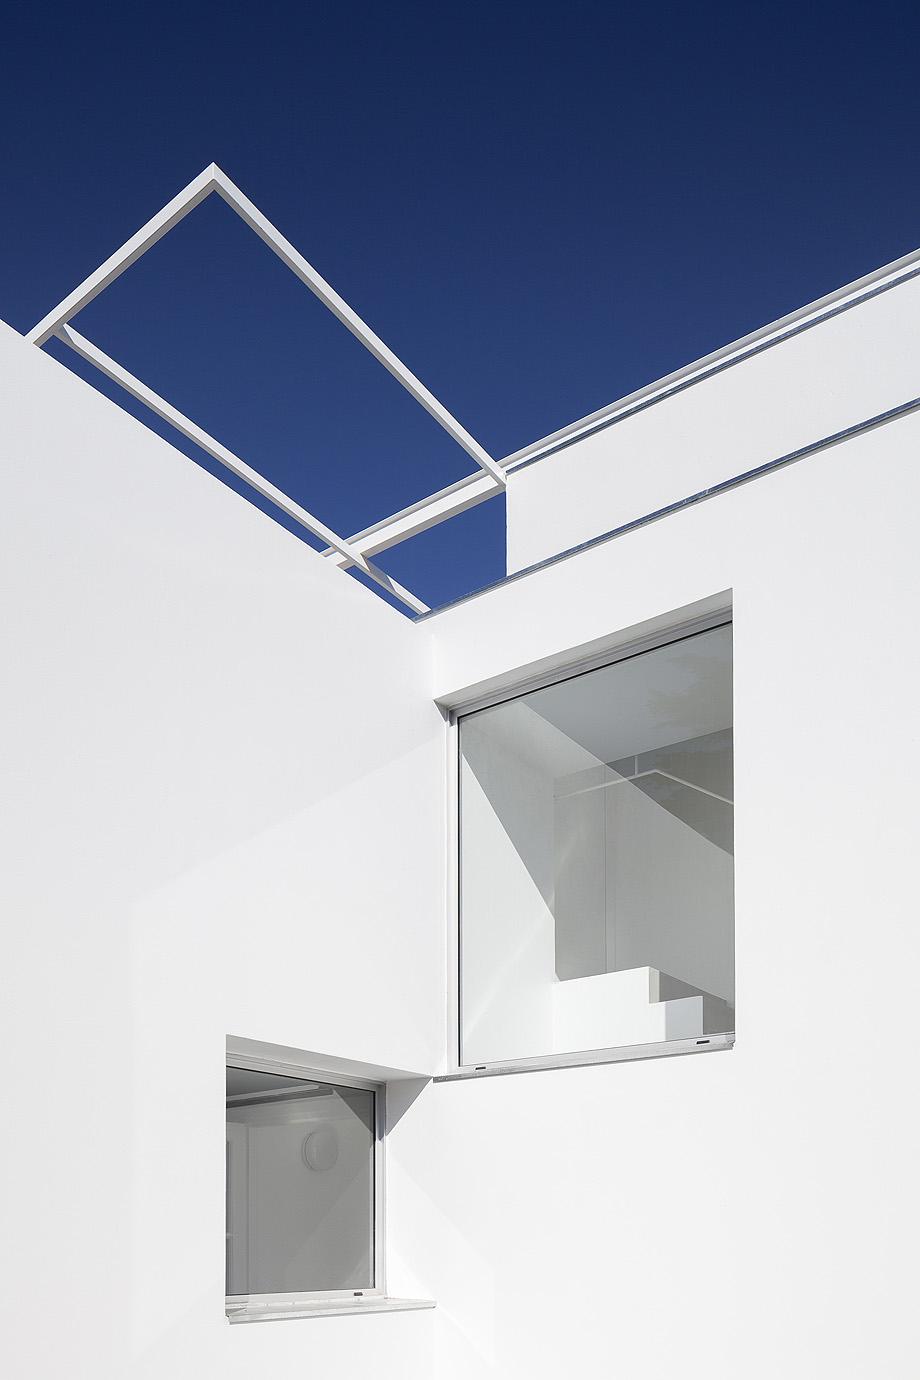 reforma vivienda ph thames por alonso & crippa - foto javier agustin rojas (4)